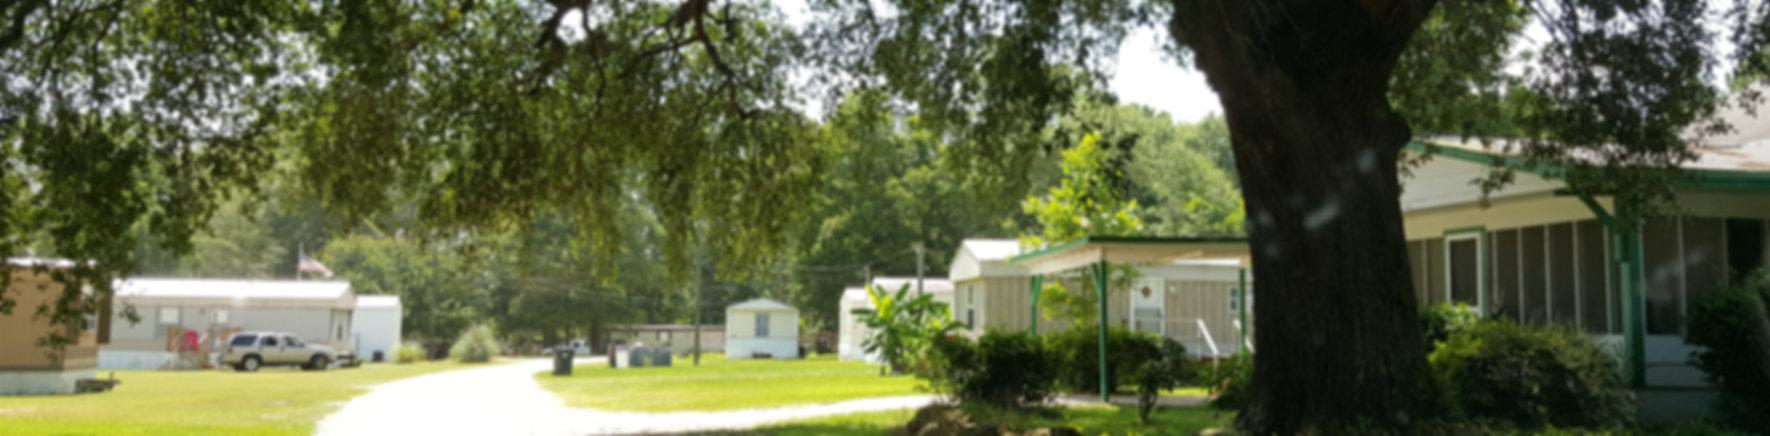 Southeast Mobile Home Park Broker